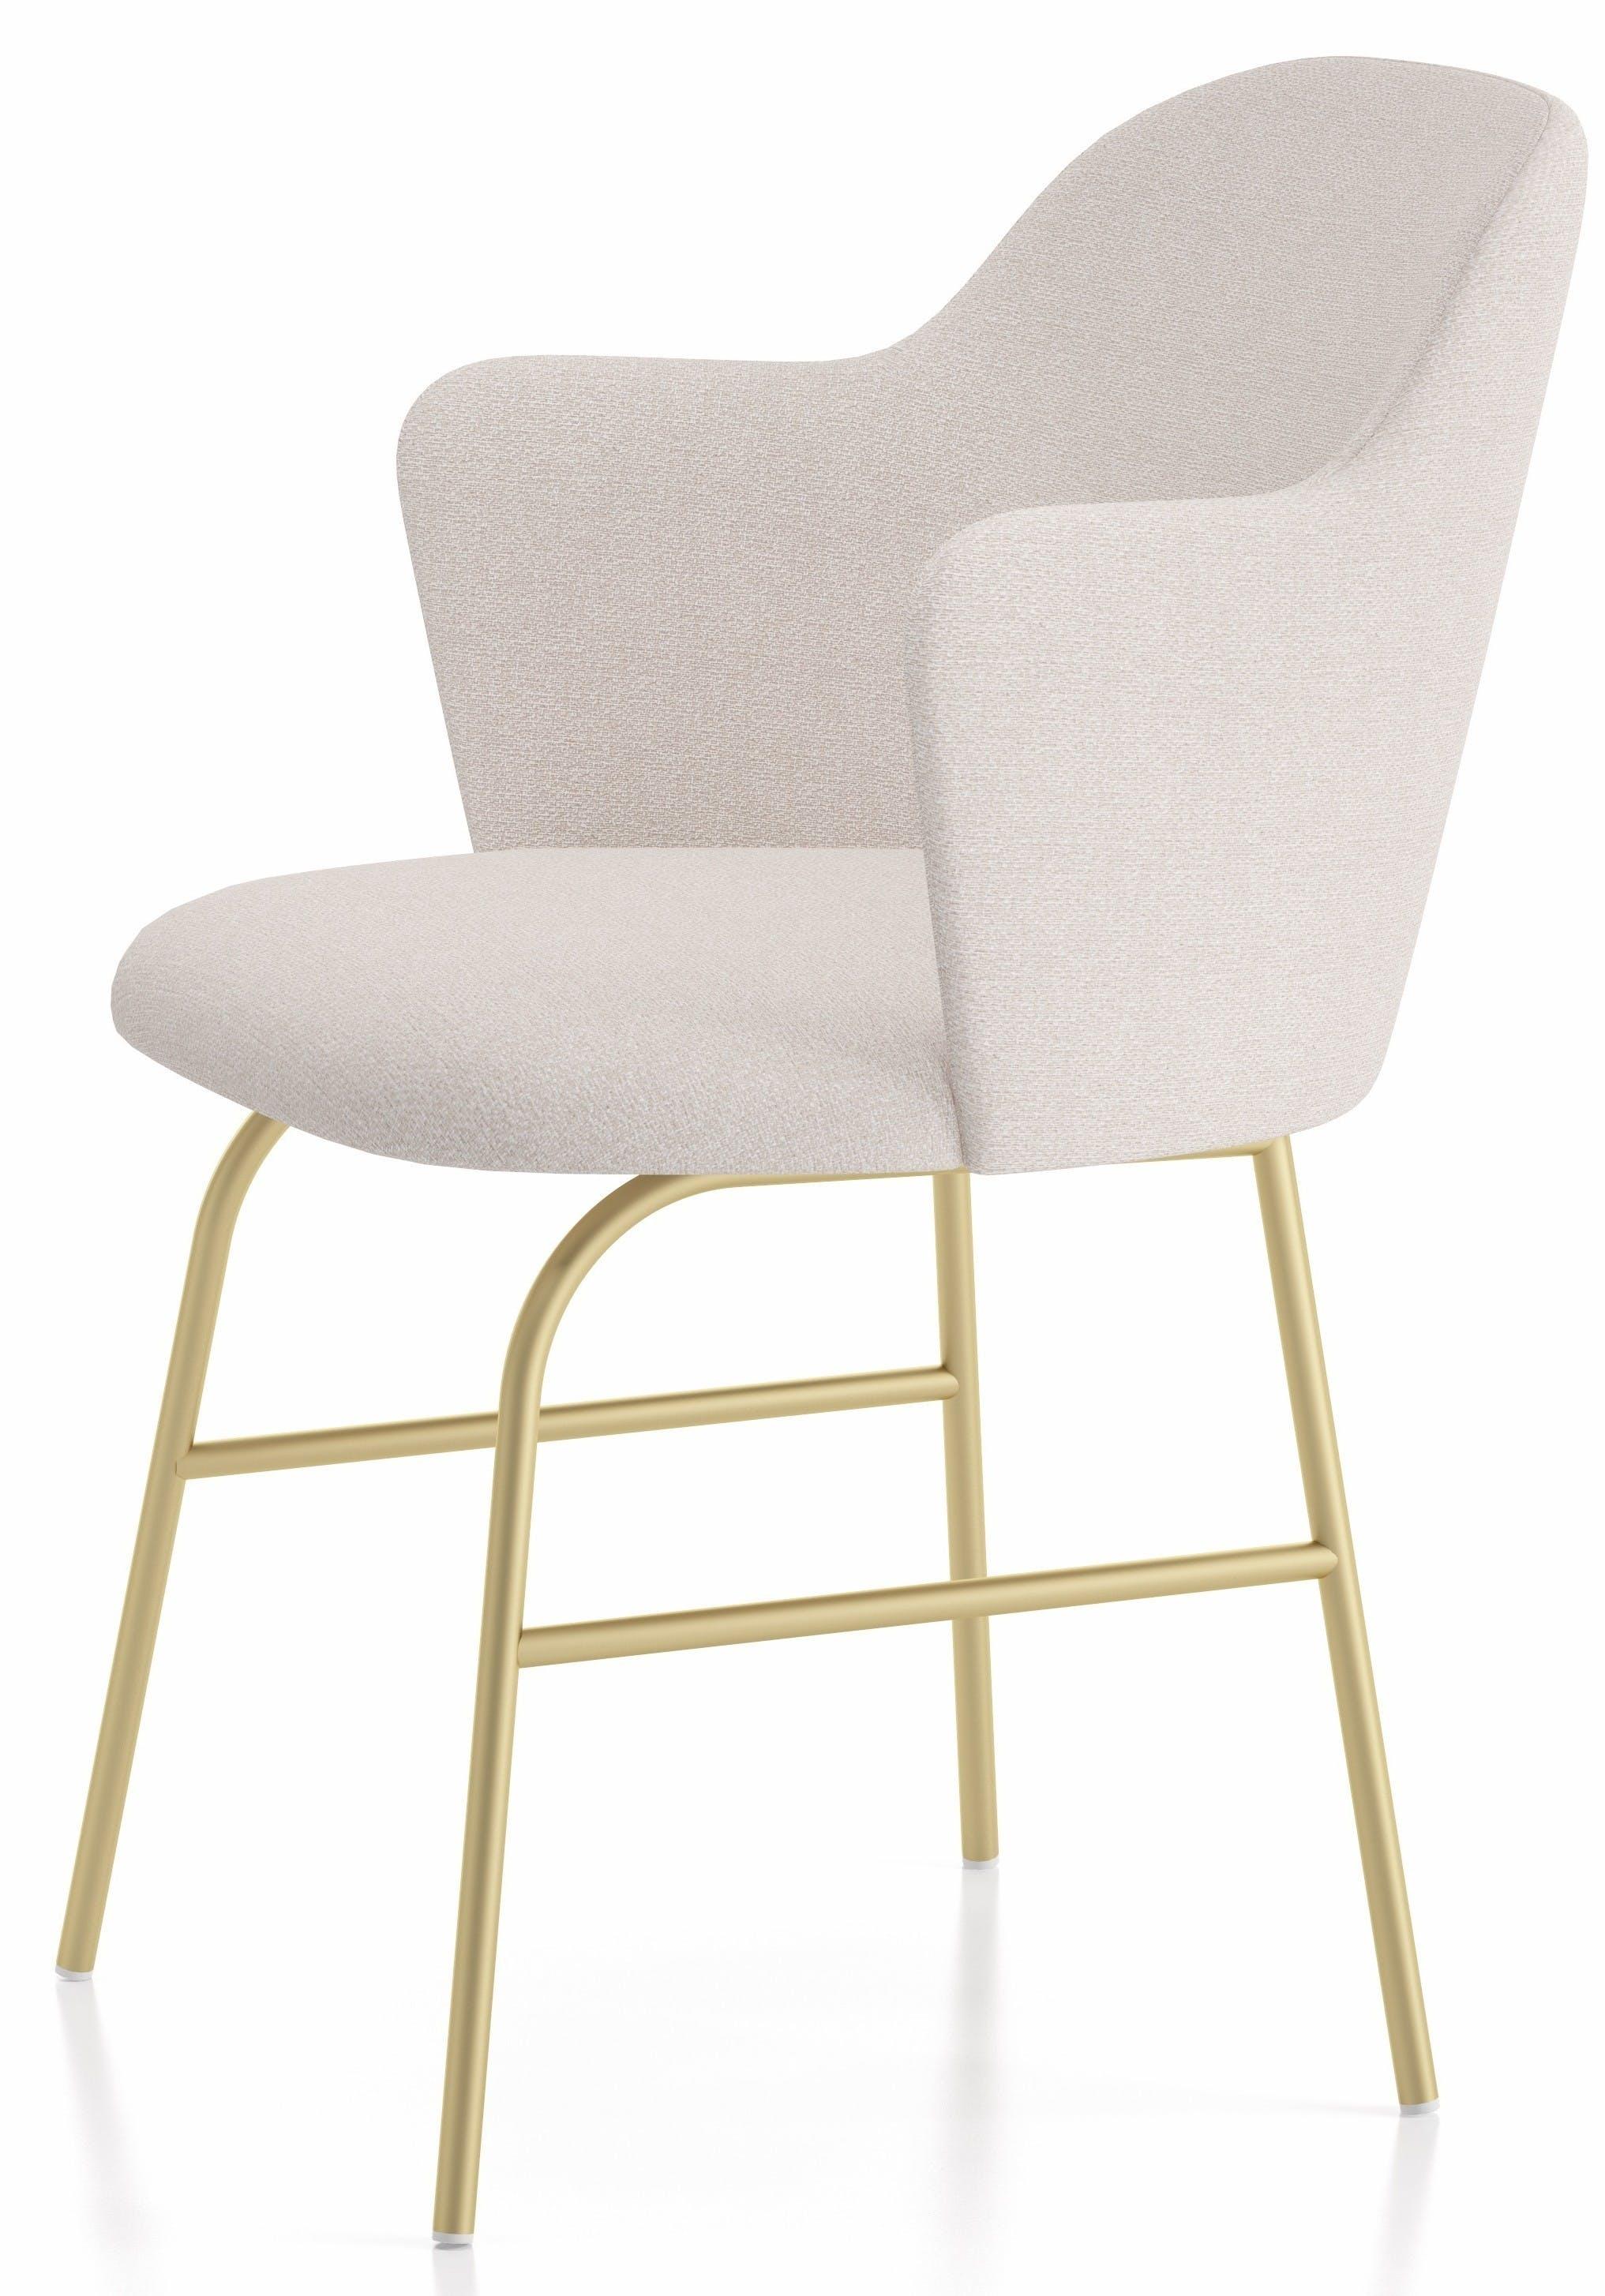 Viccarbe-gold-leg-armchair-aleta-haute-living